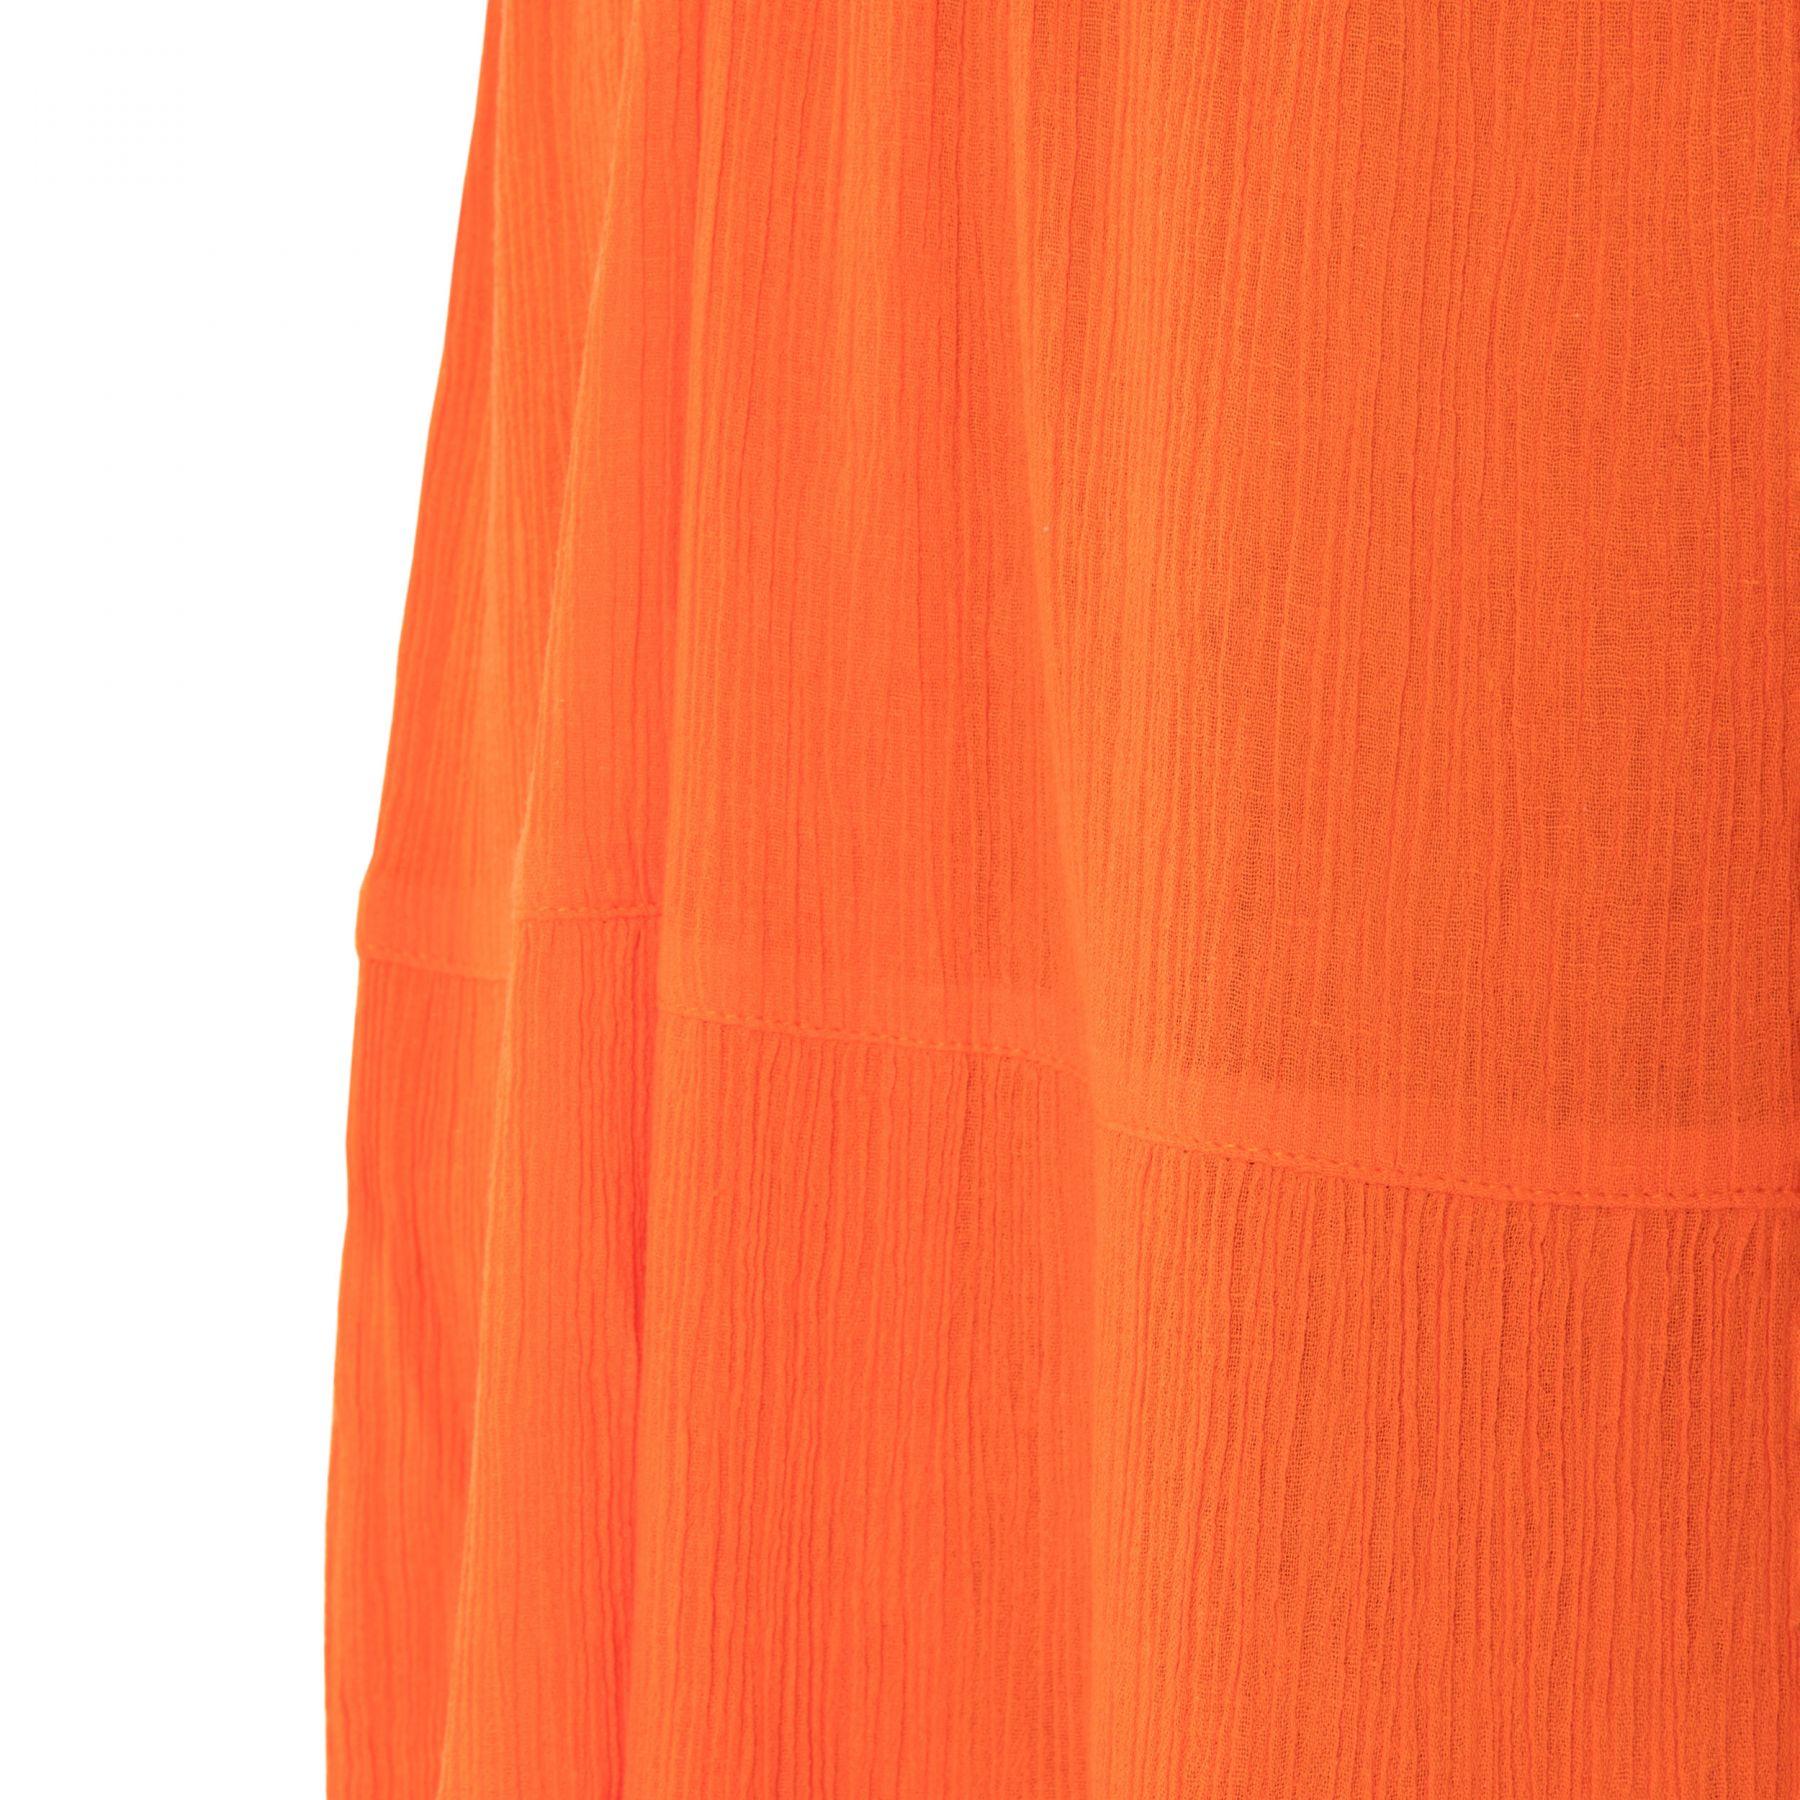 Сарафан Melissa Odabash FRU оранжевый